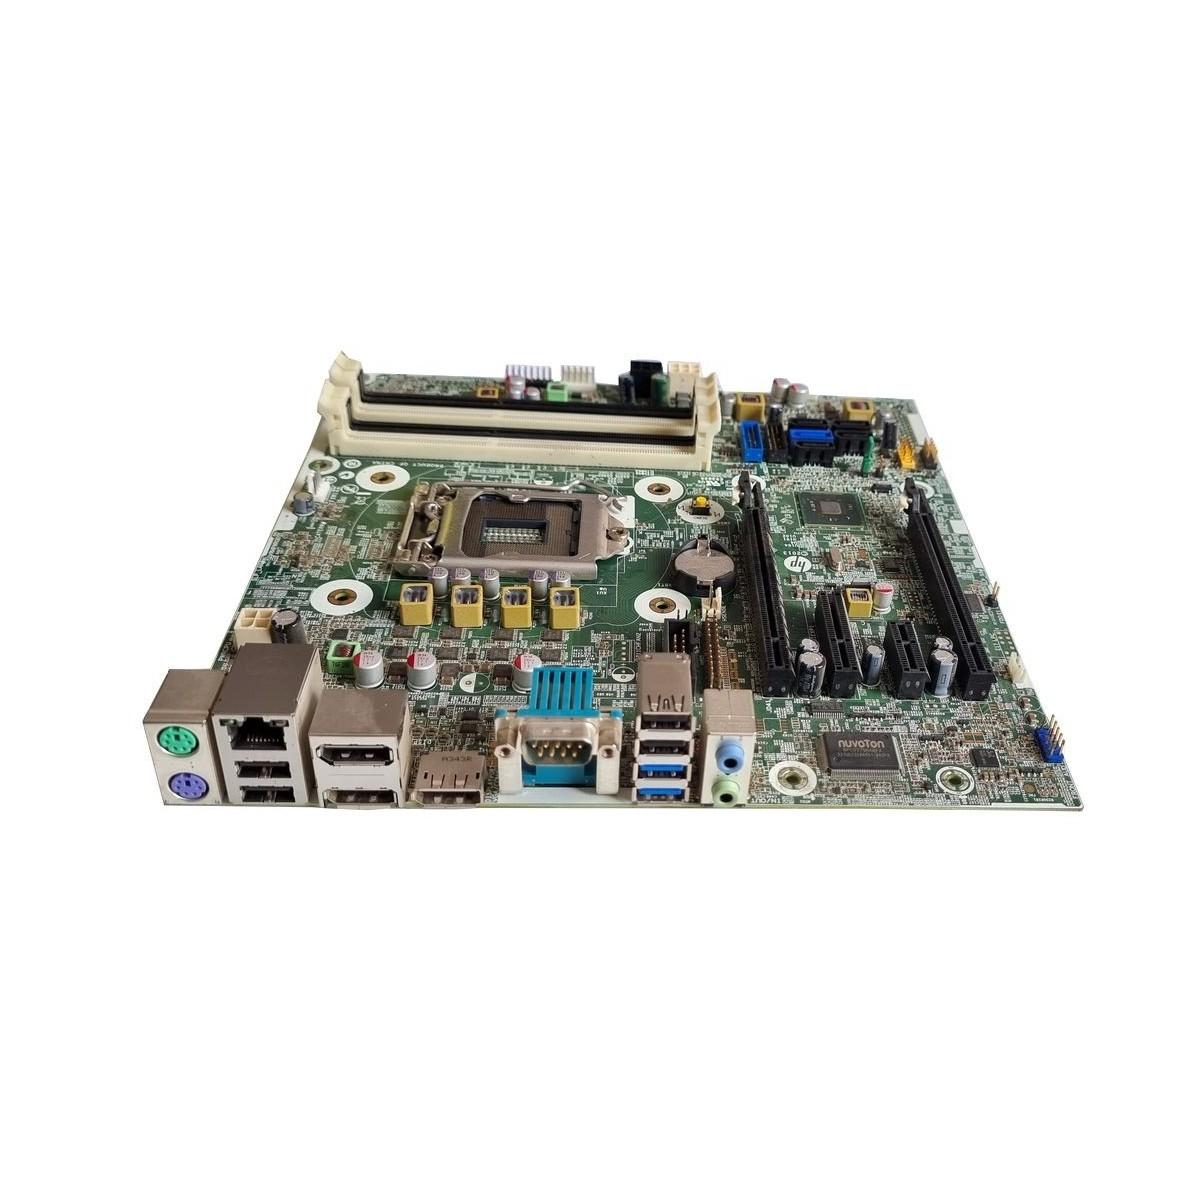 KOLEKCJONERSKA PAMIEC IBM 8MB 72-PIN SIMM 74G1300